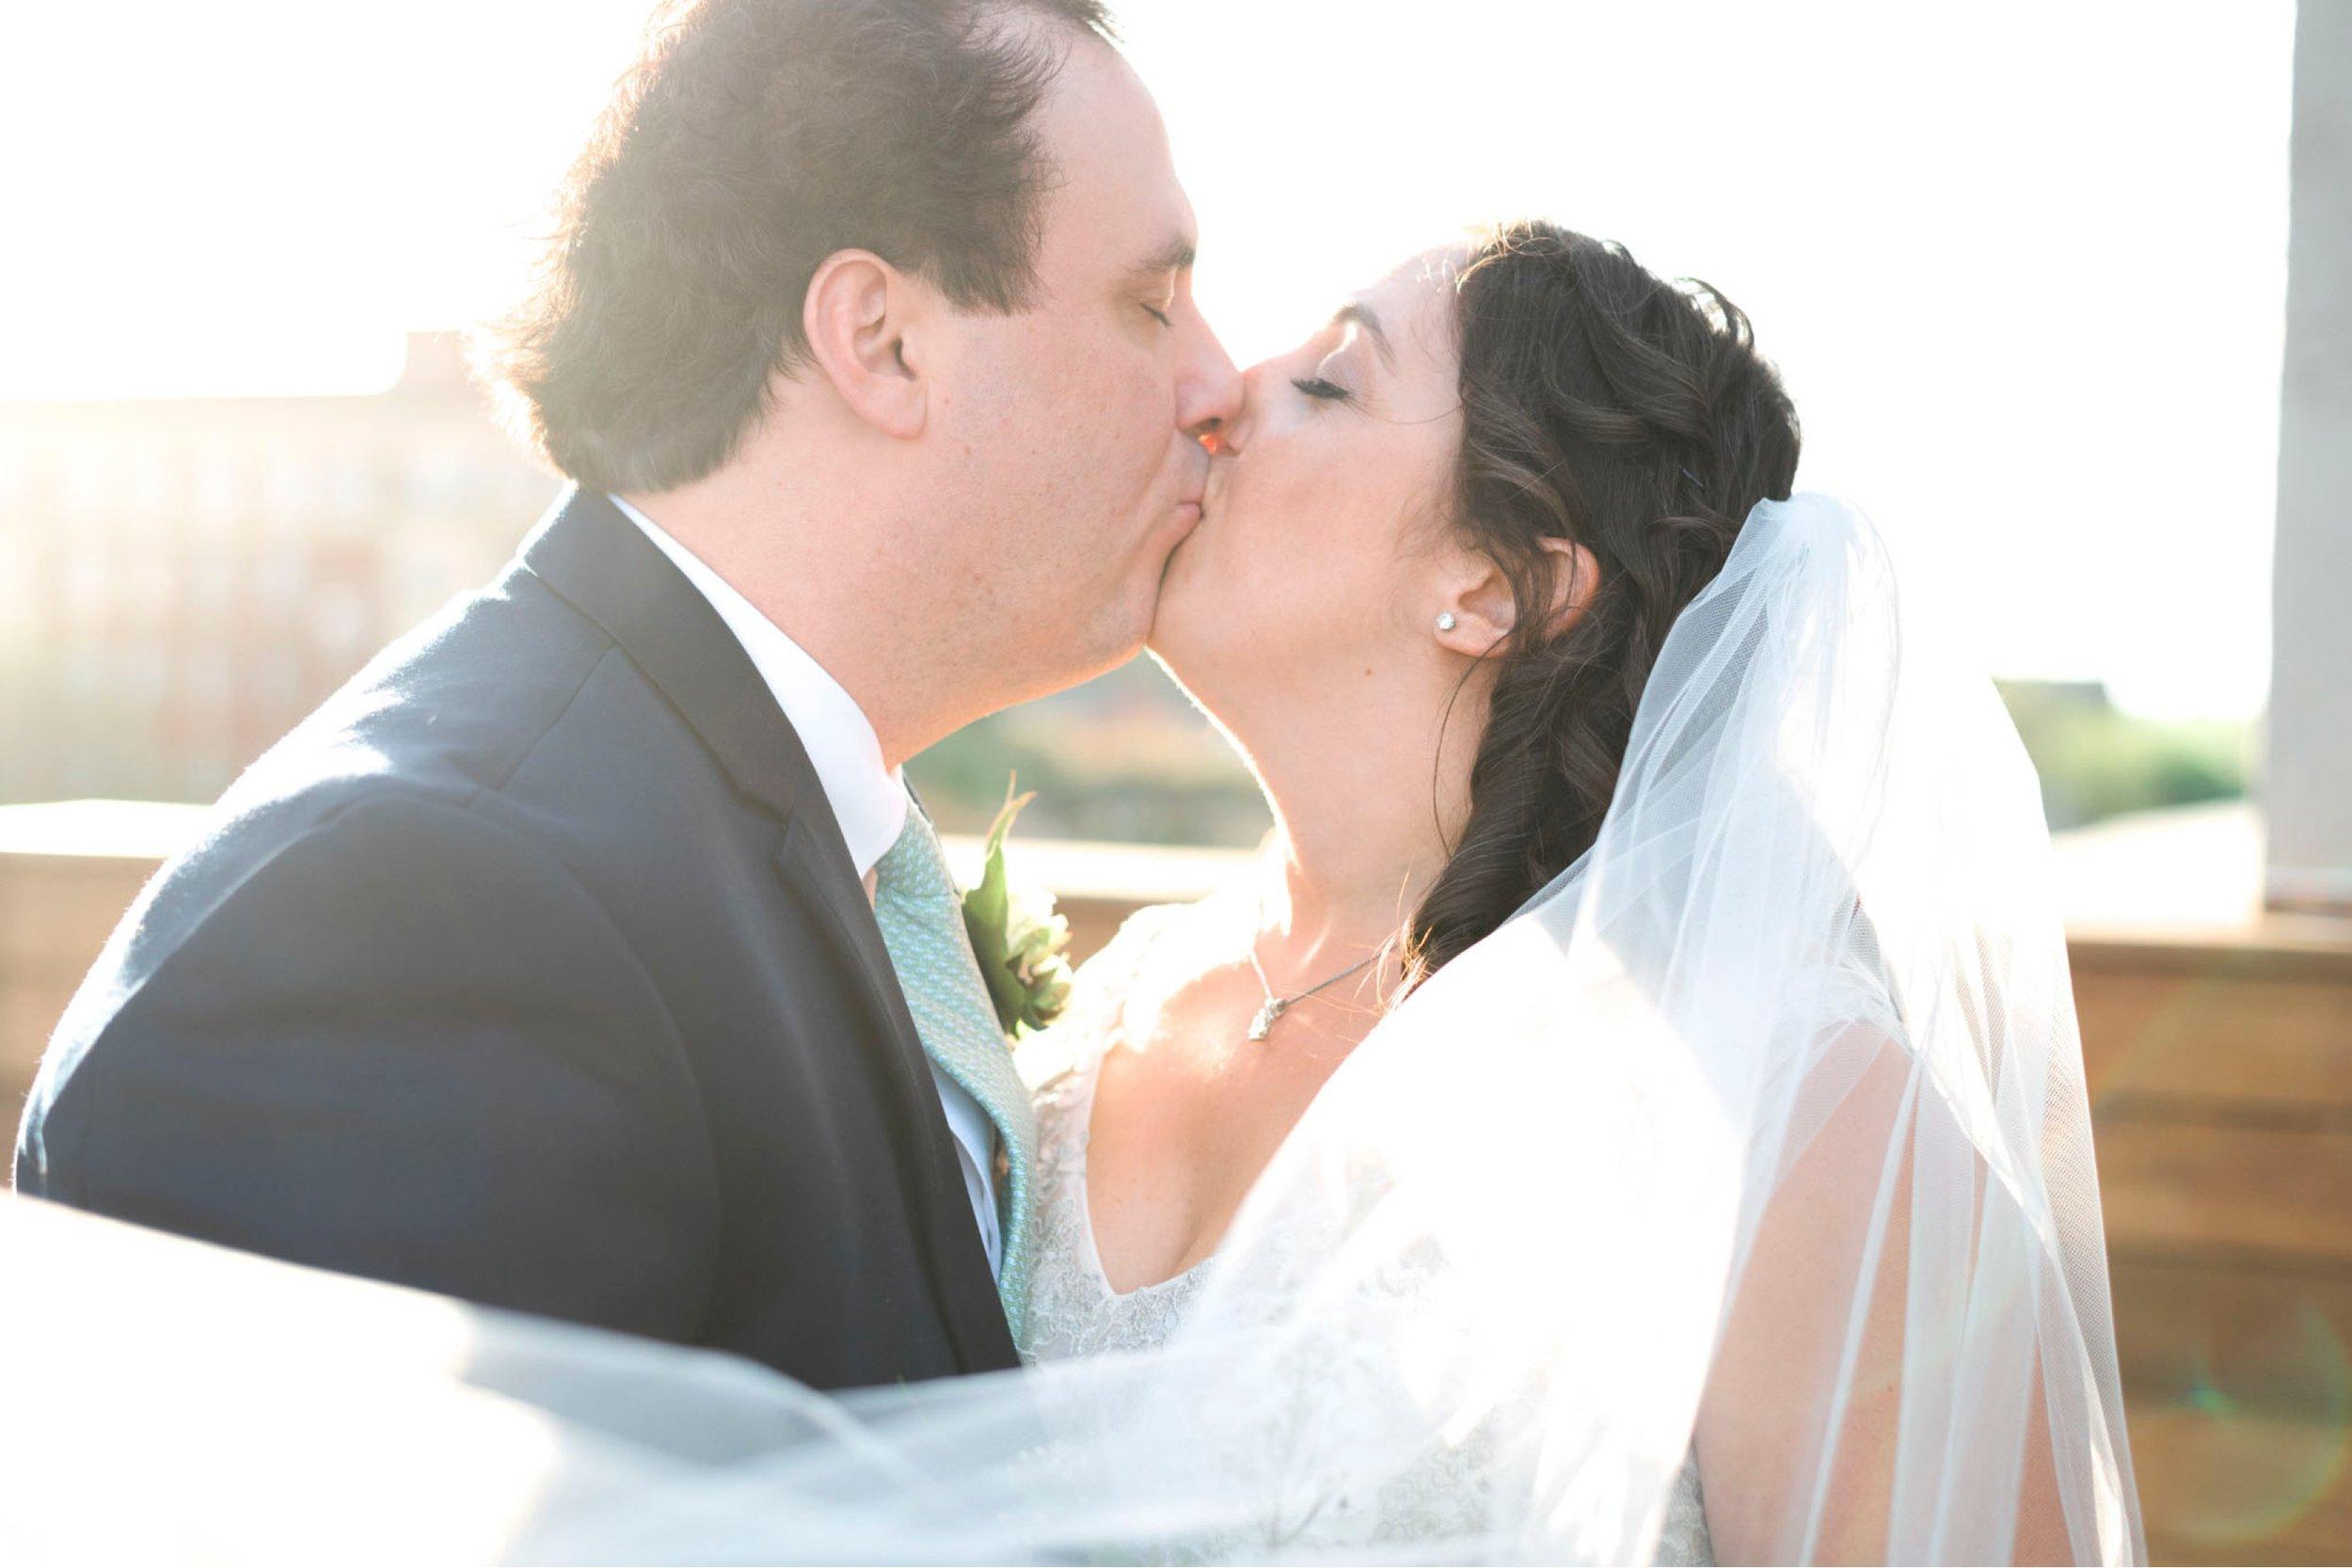 TheVirginianHotel_LynchburgVA_TheVirginianHotelWedding_Virginiaweddingphotographer_Lynchburgvawedding 41.jpg